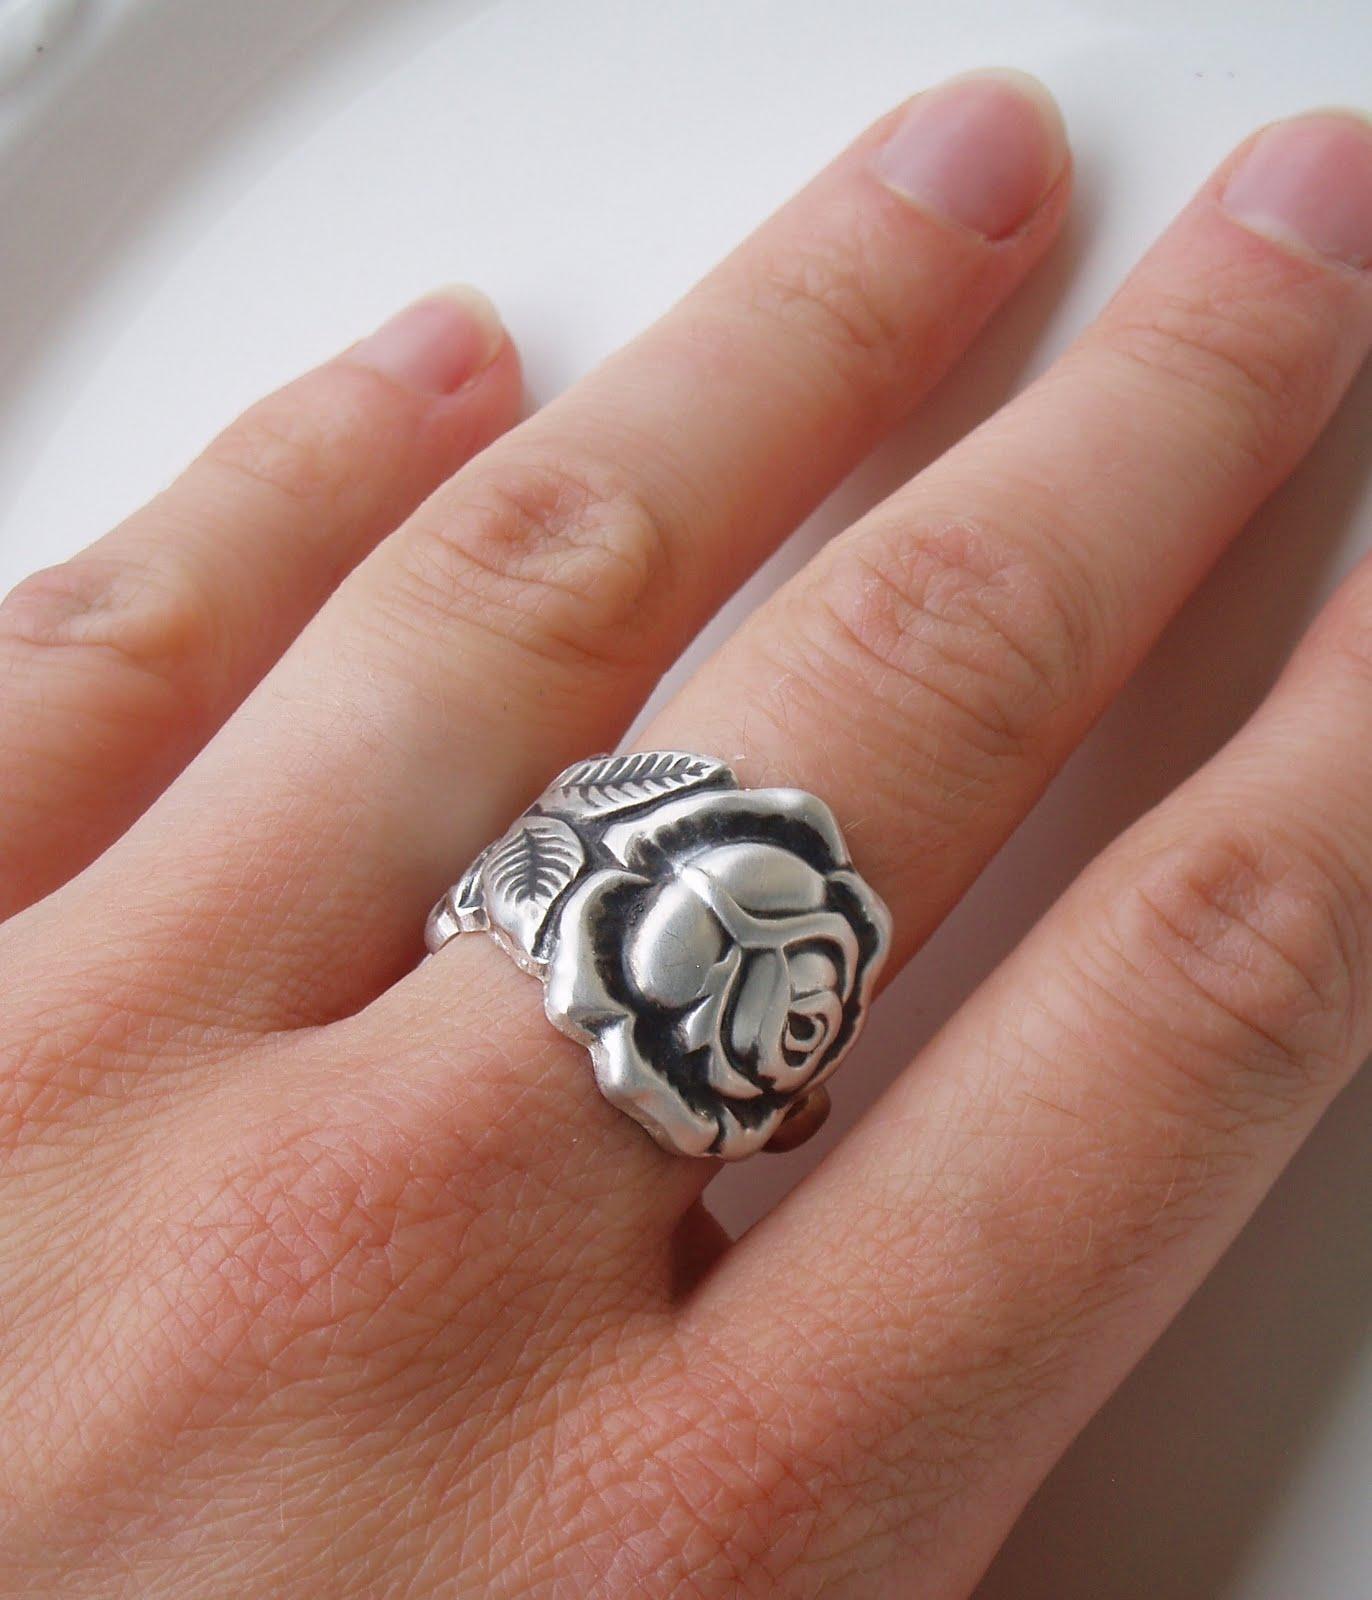 silvermoon ring hildesheimer rose. Black Bedroom Furniture Sets. Home Design Ideas